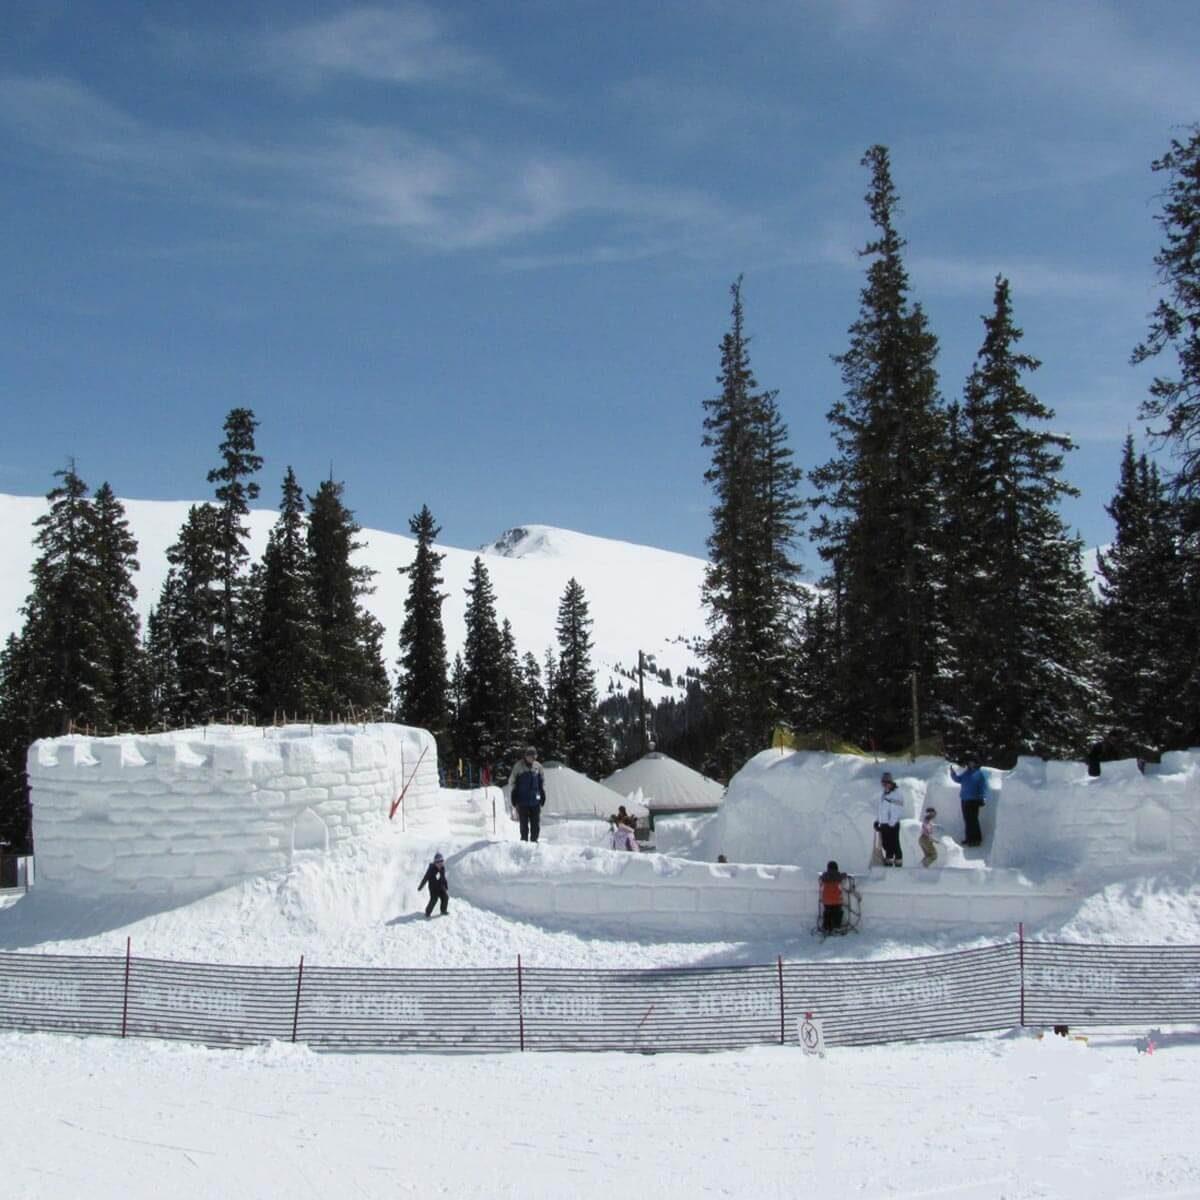 keystone-032410-c-karen-rubin-072e2-kidtopia1 castle snow fort